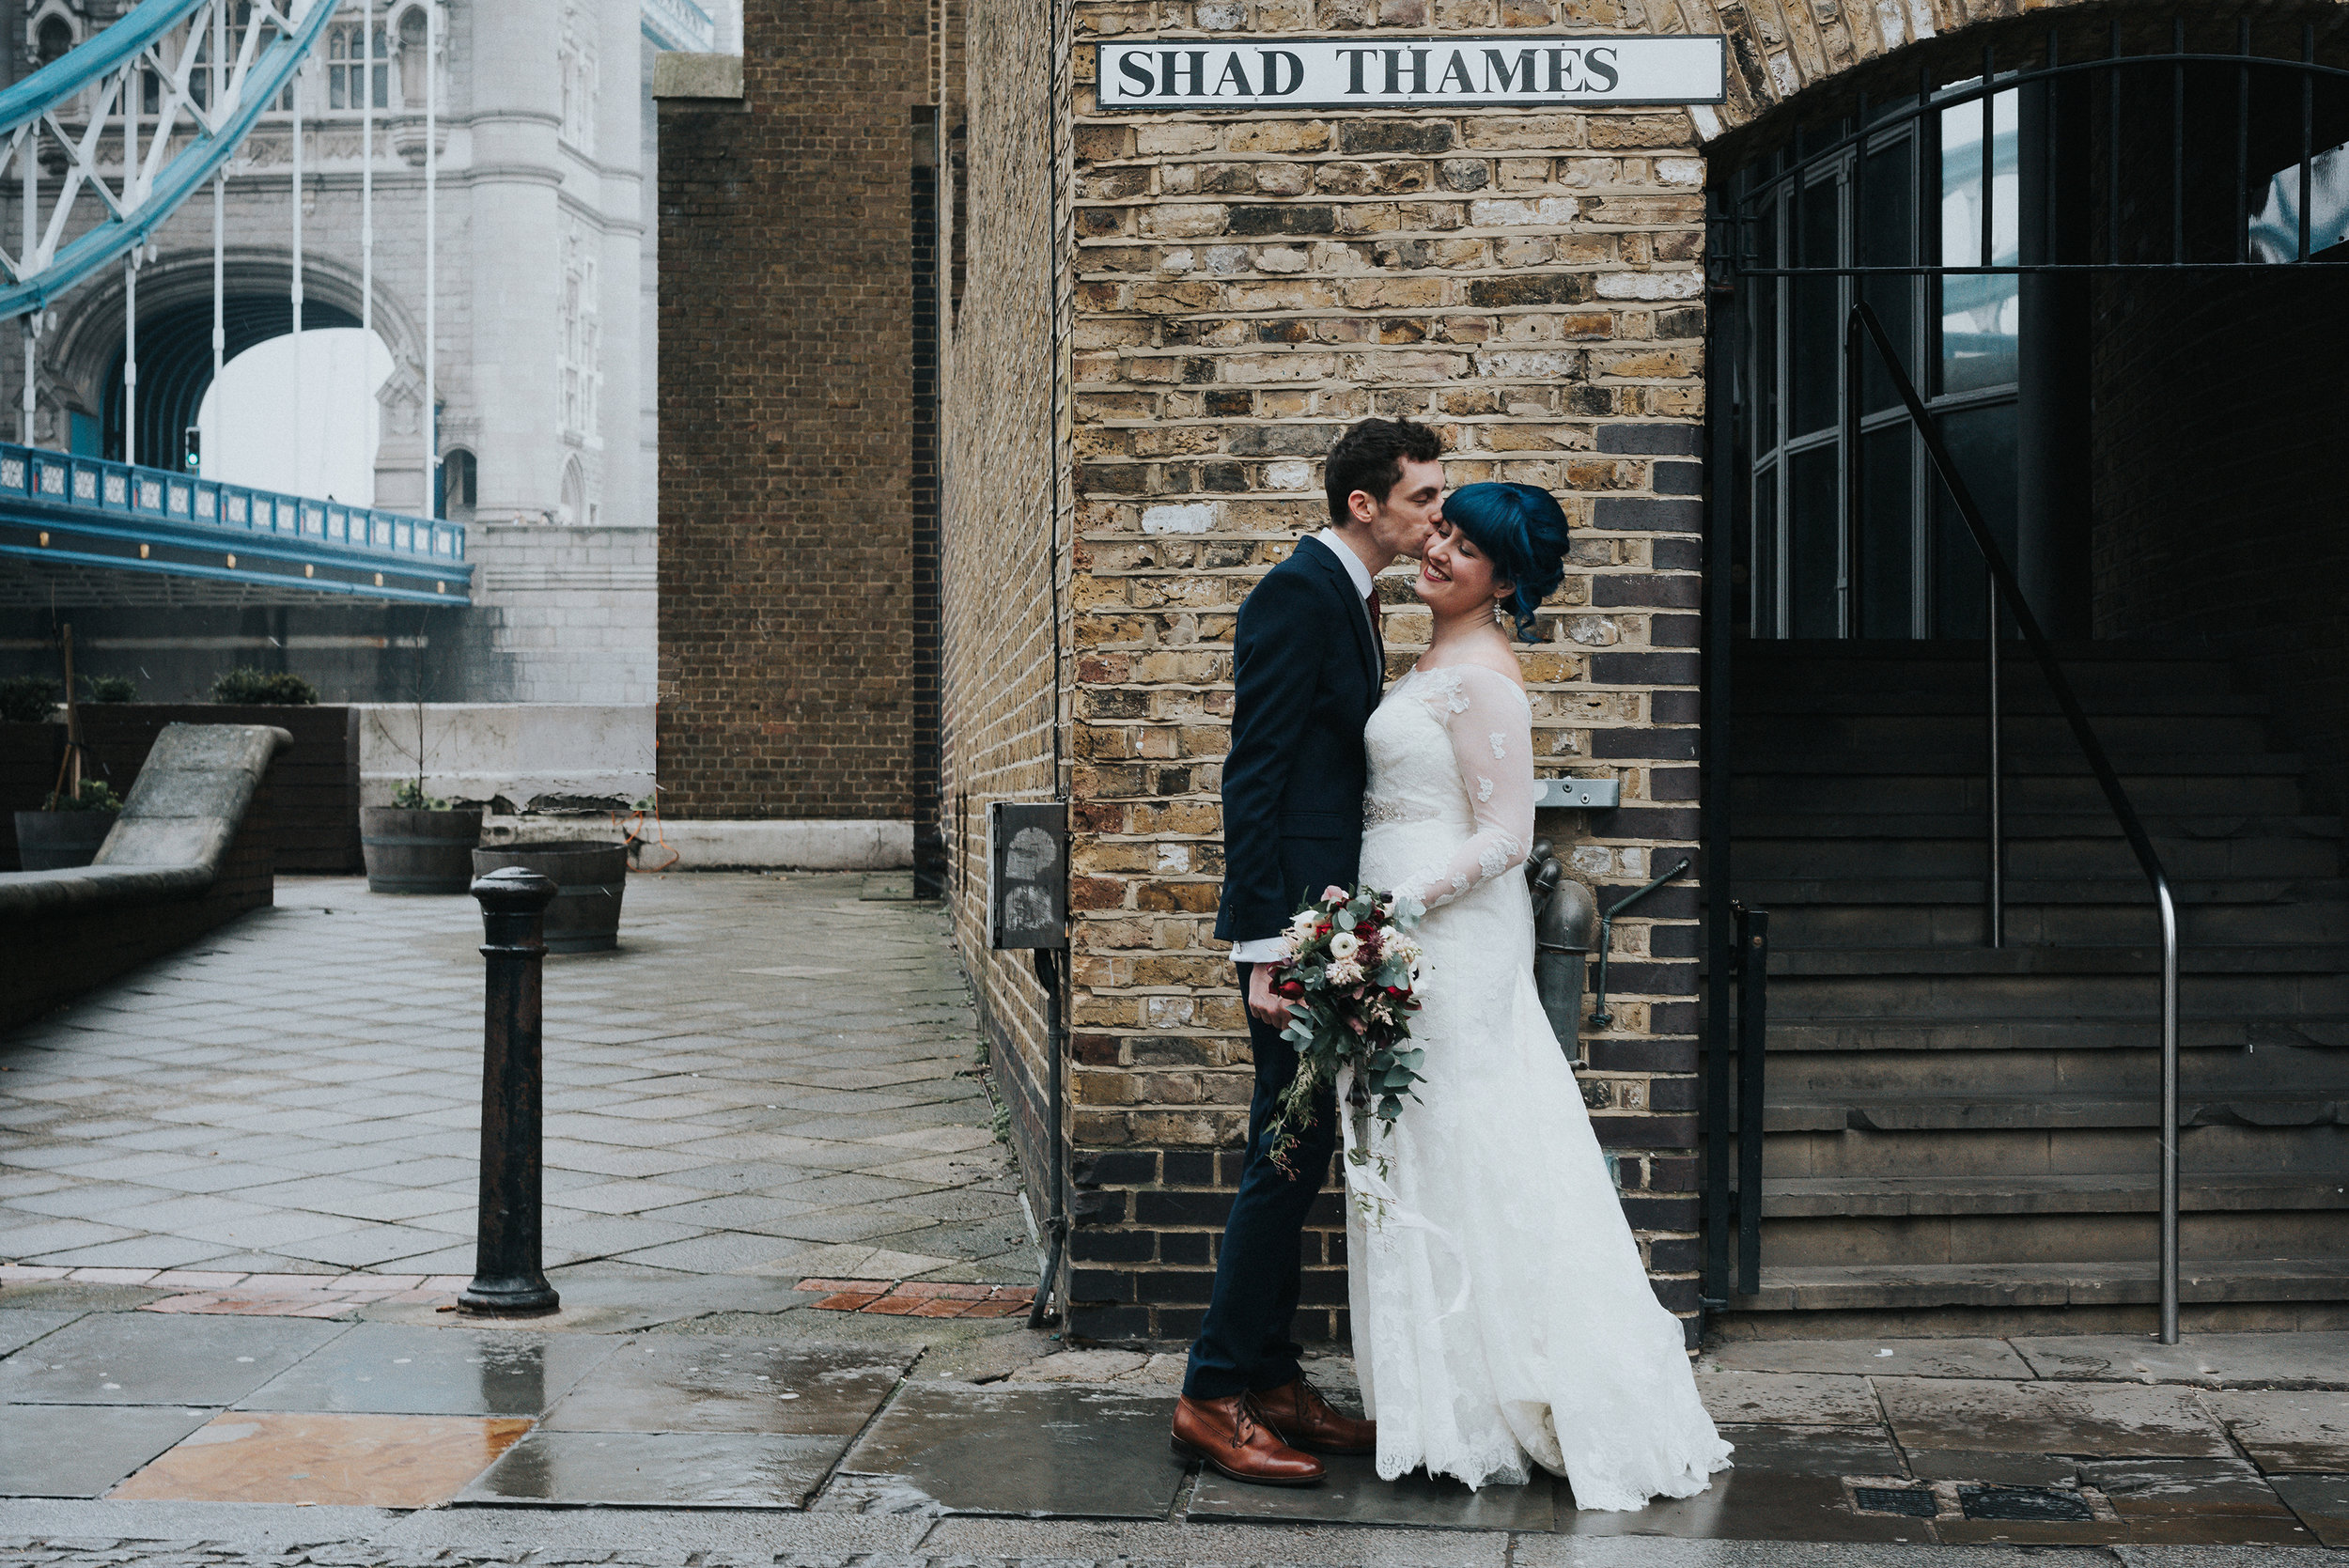 London-Chic-Alternative-Wedding-Jay-Tunbridge-Photographic-Co-9.jpg